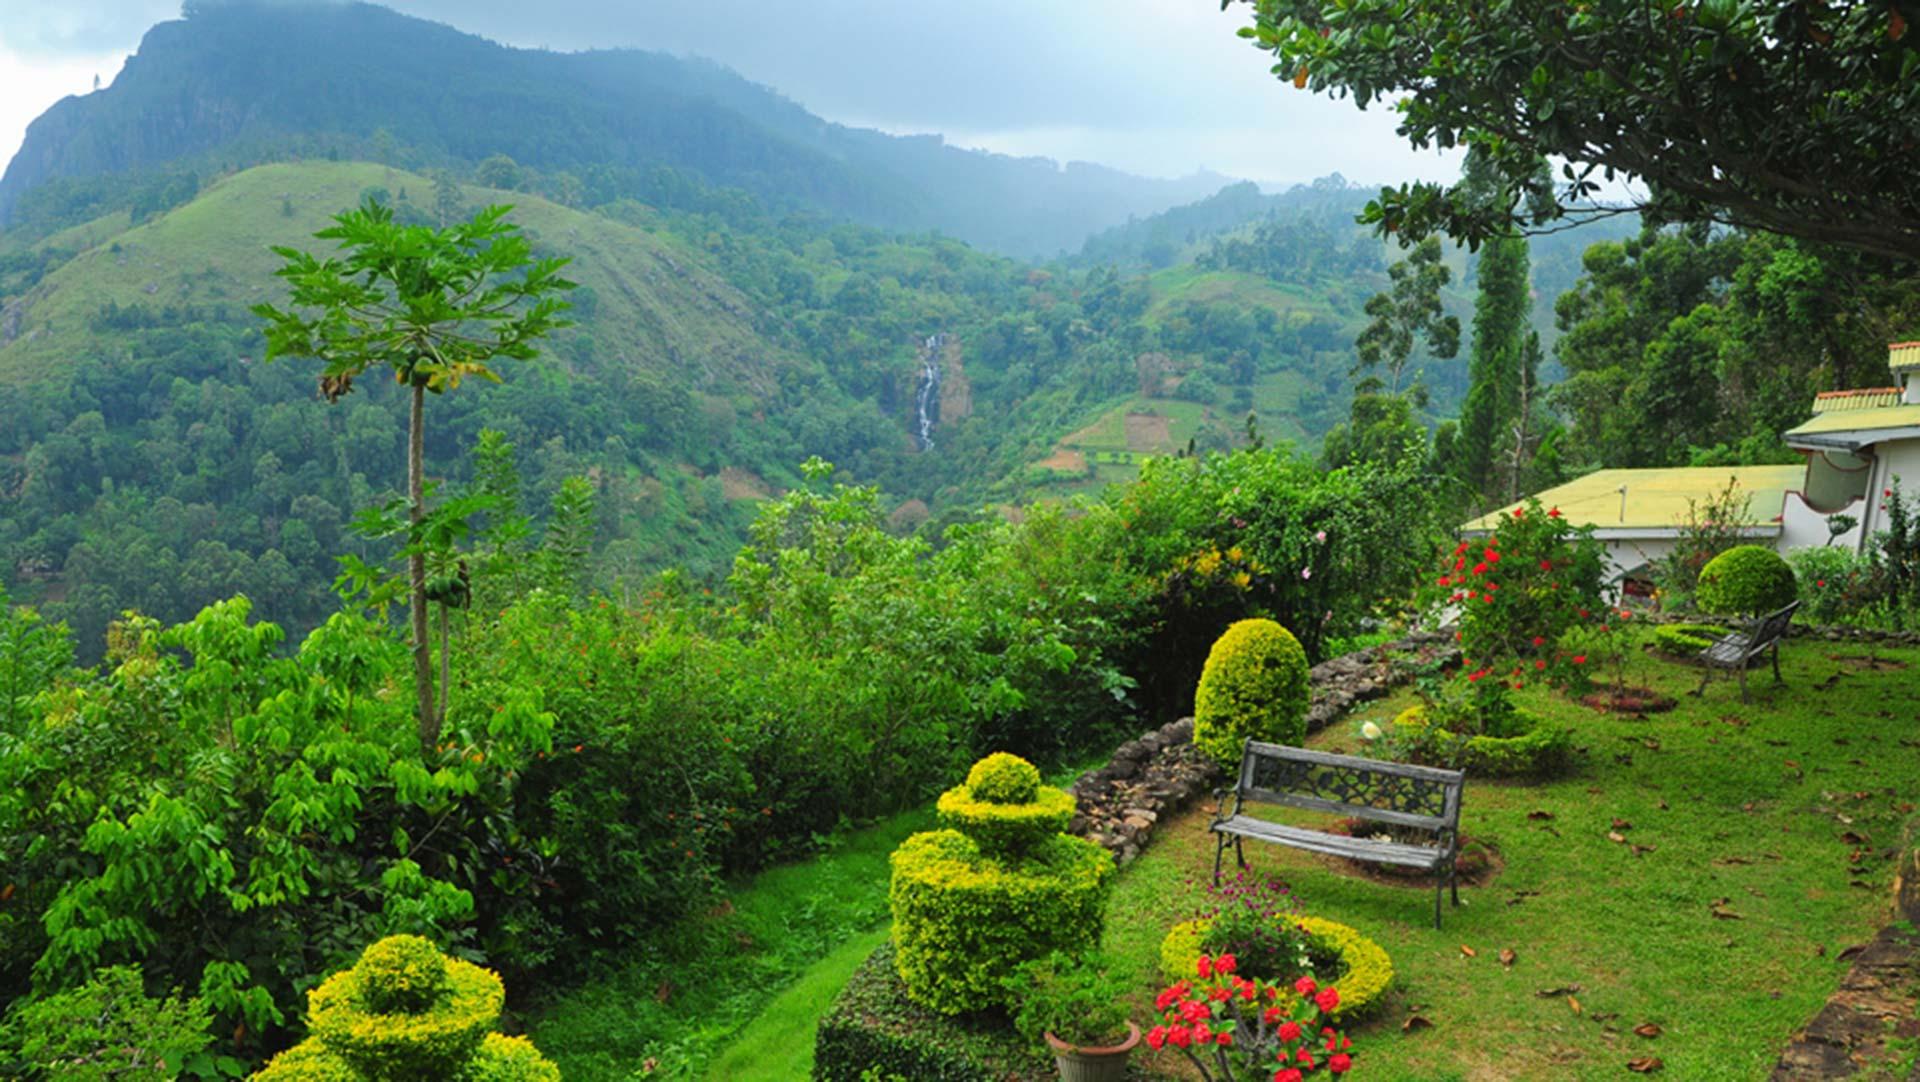 View from above Ella Gap, Sri Lanka